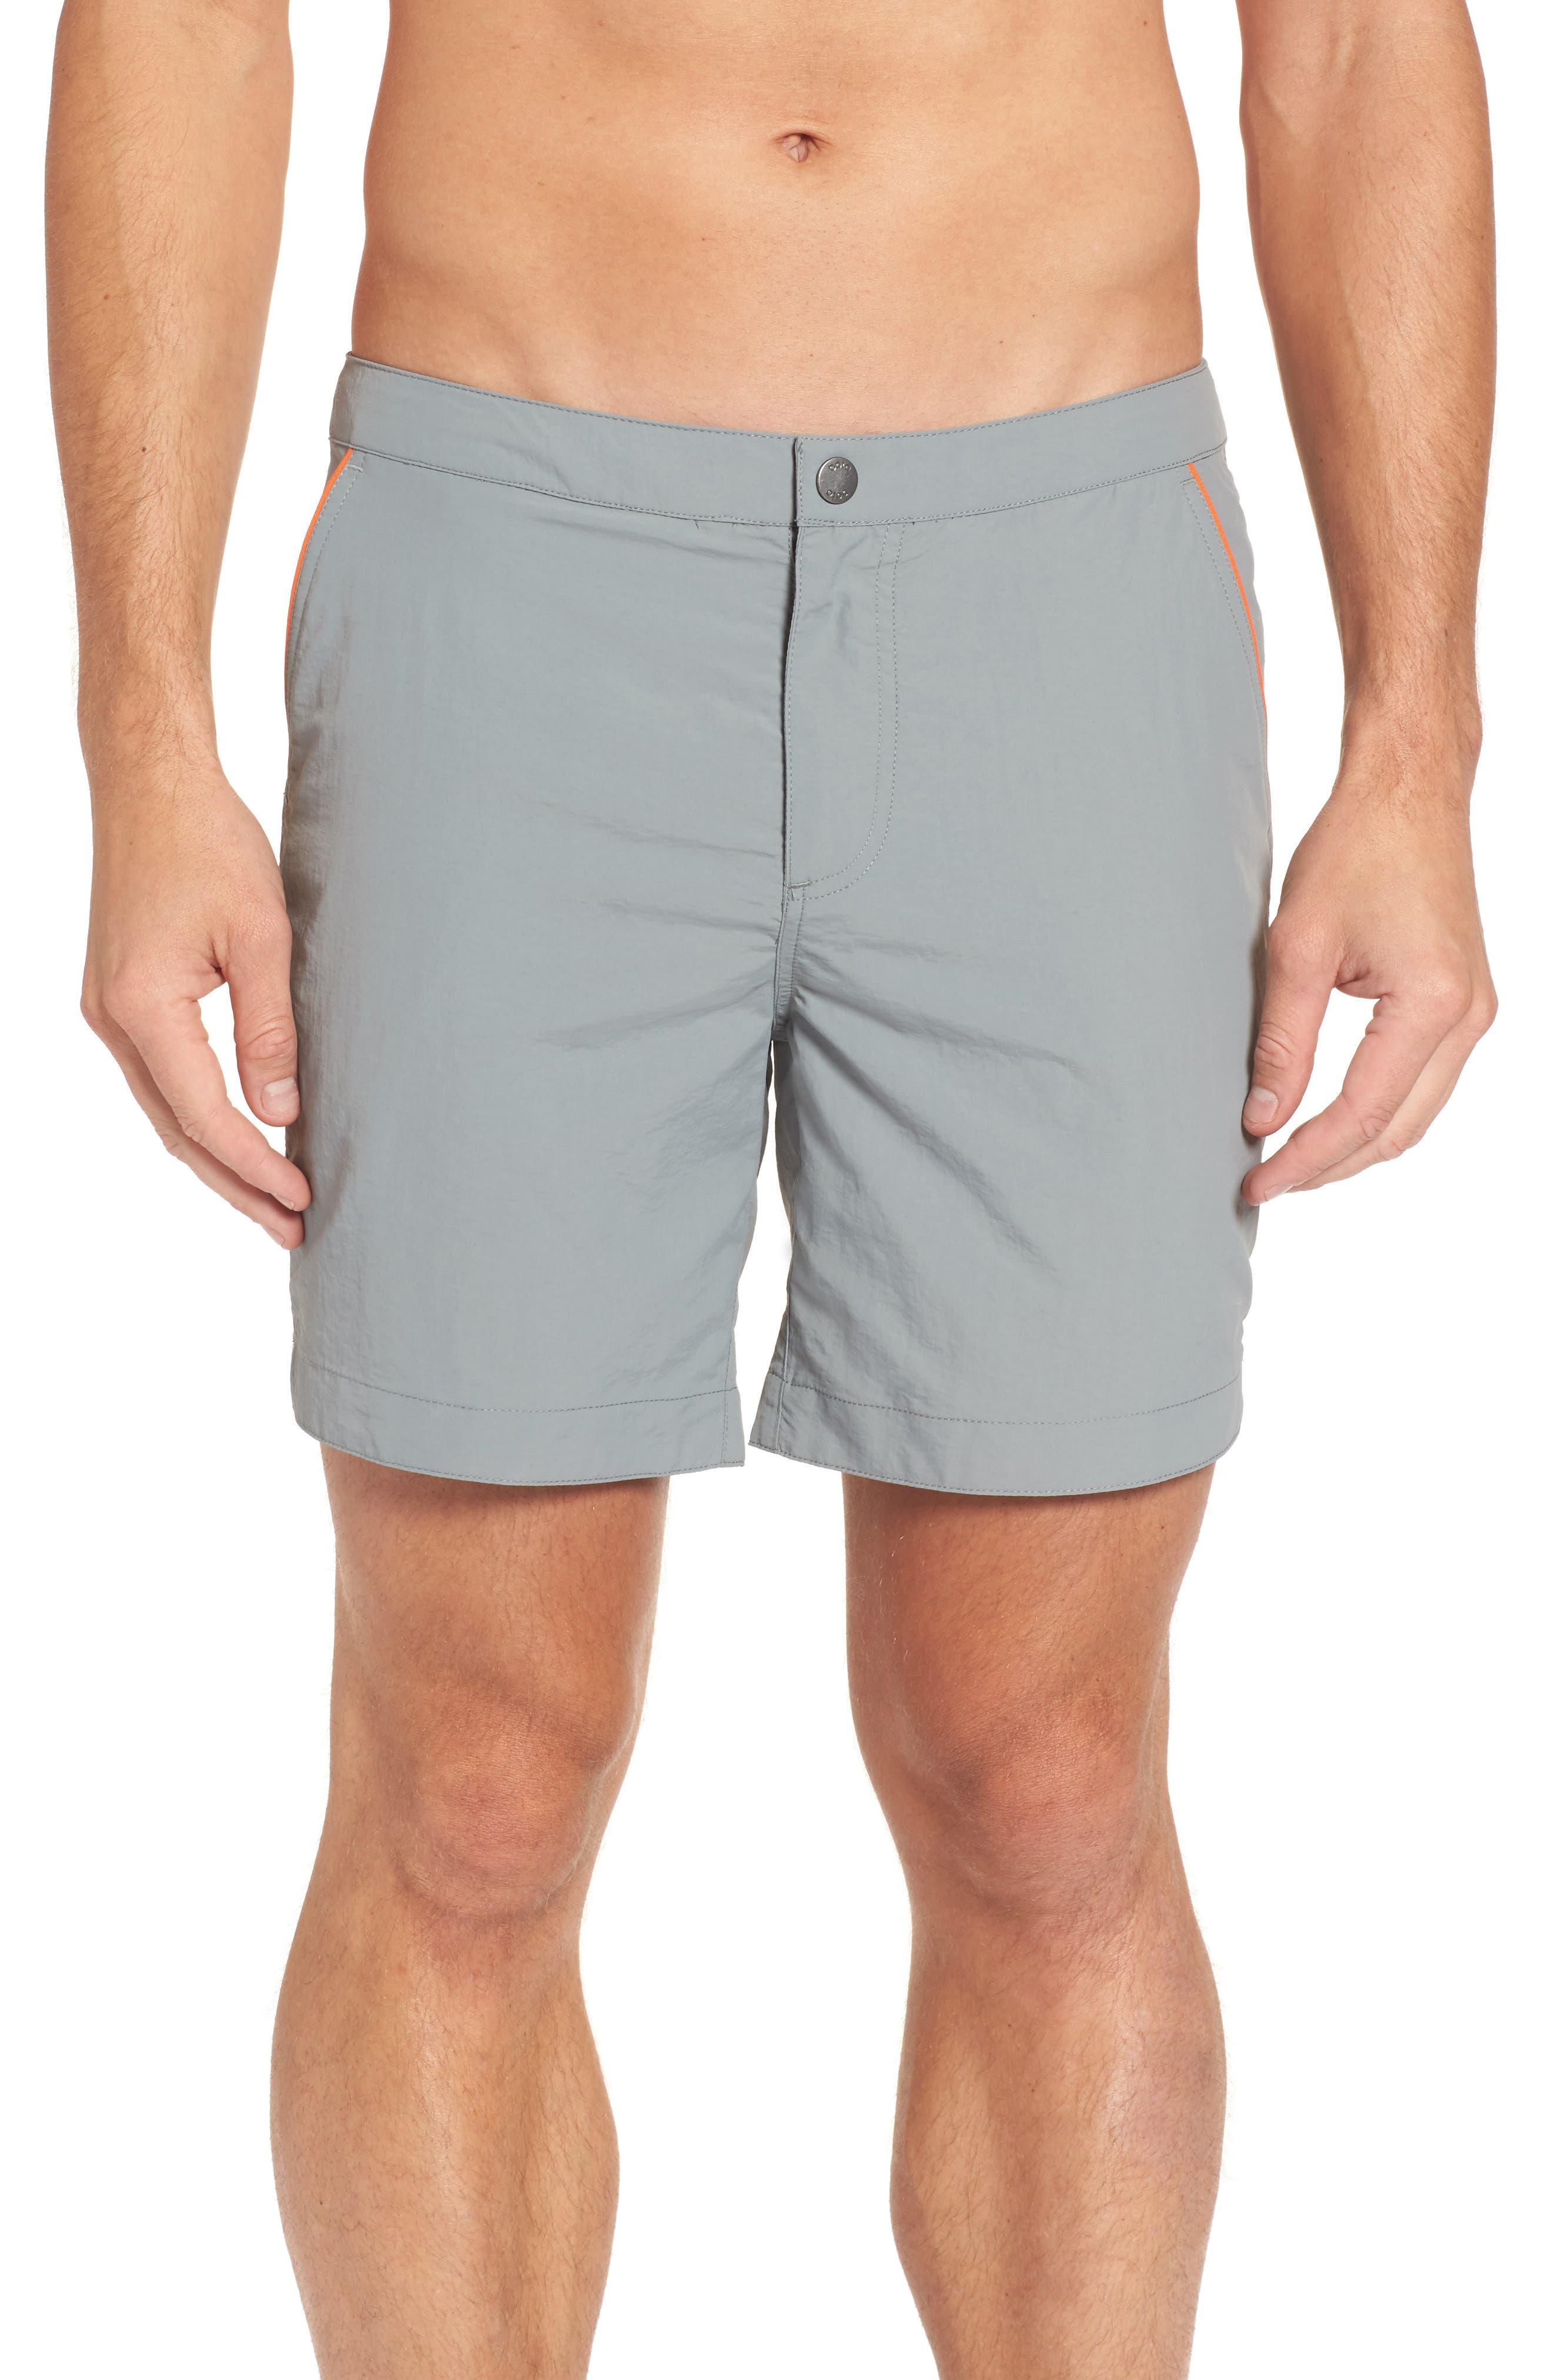 Rio Regular Fit Swim Trunks,                         Main,                         color, Grey Solid